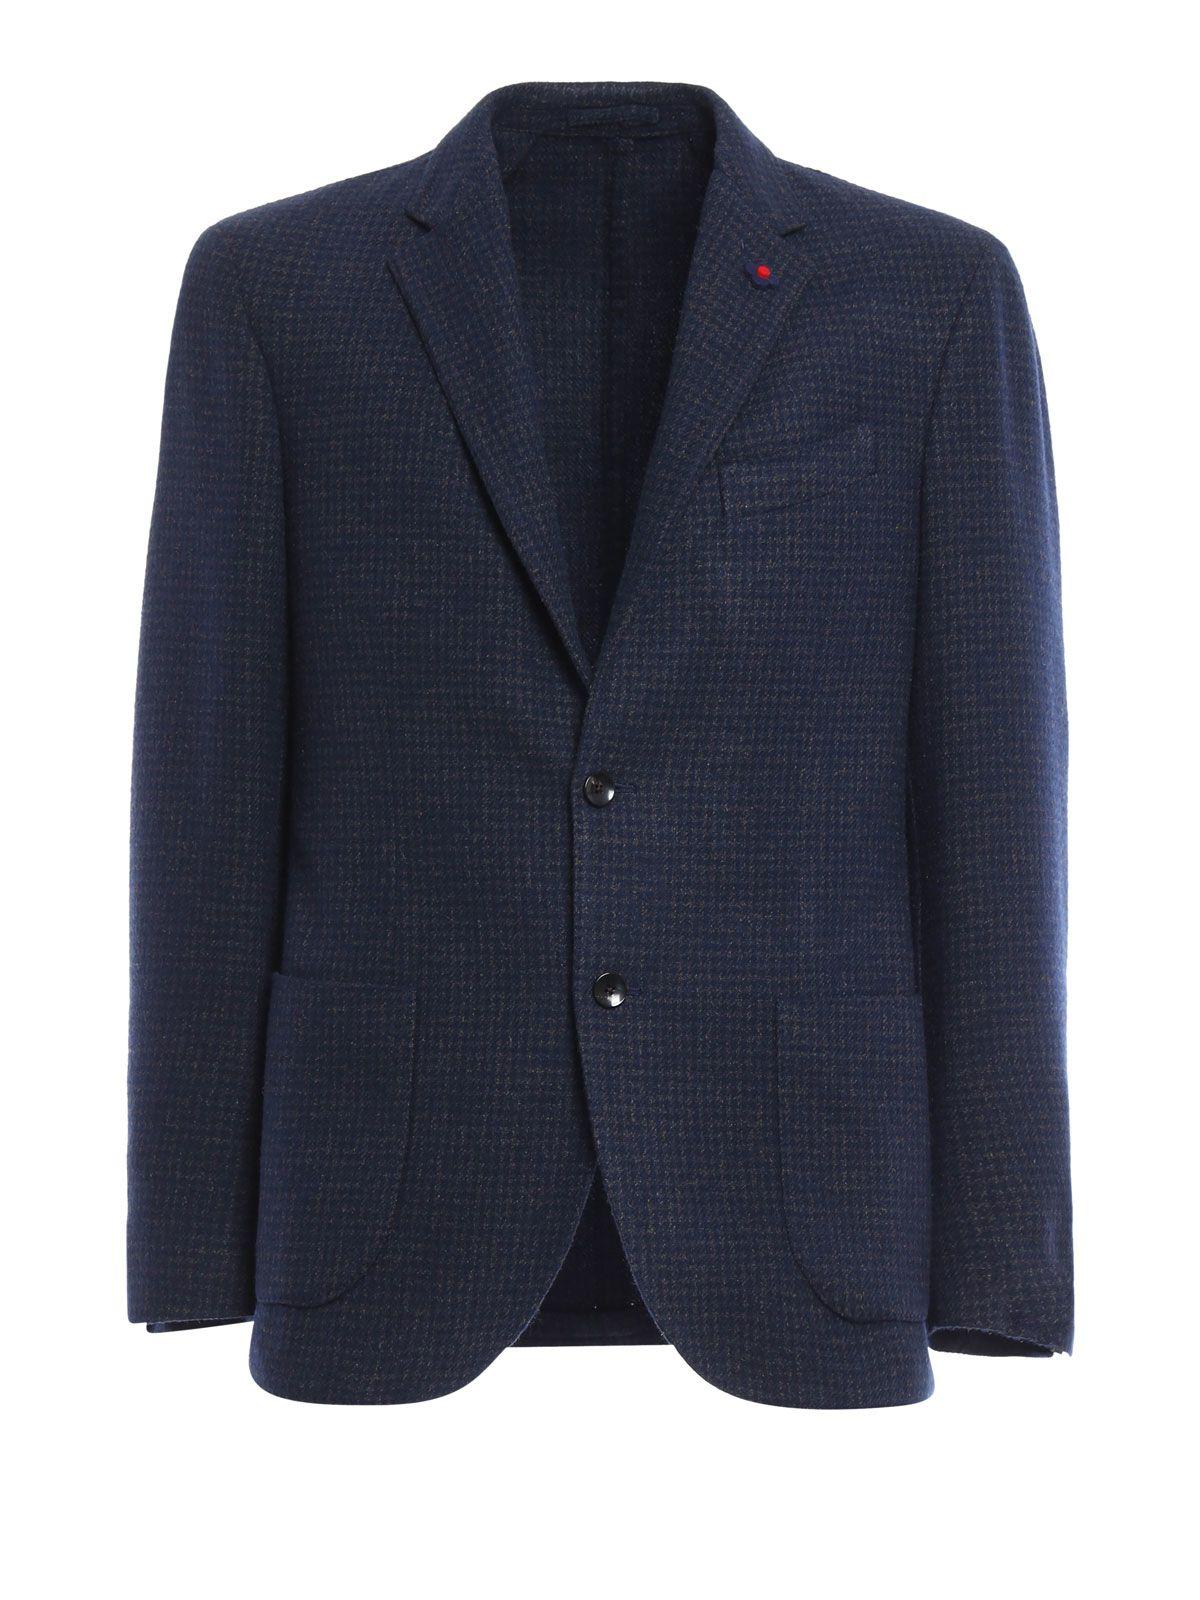 Lardini Check Patterned Wool Blend Blazer